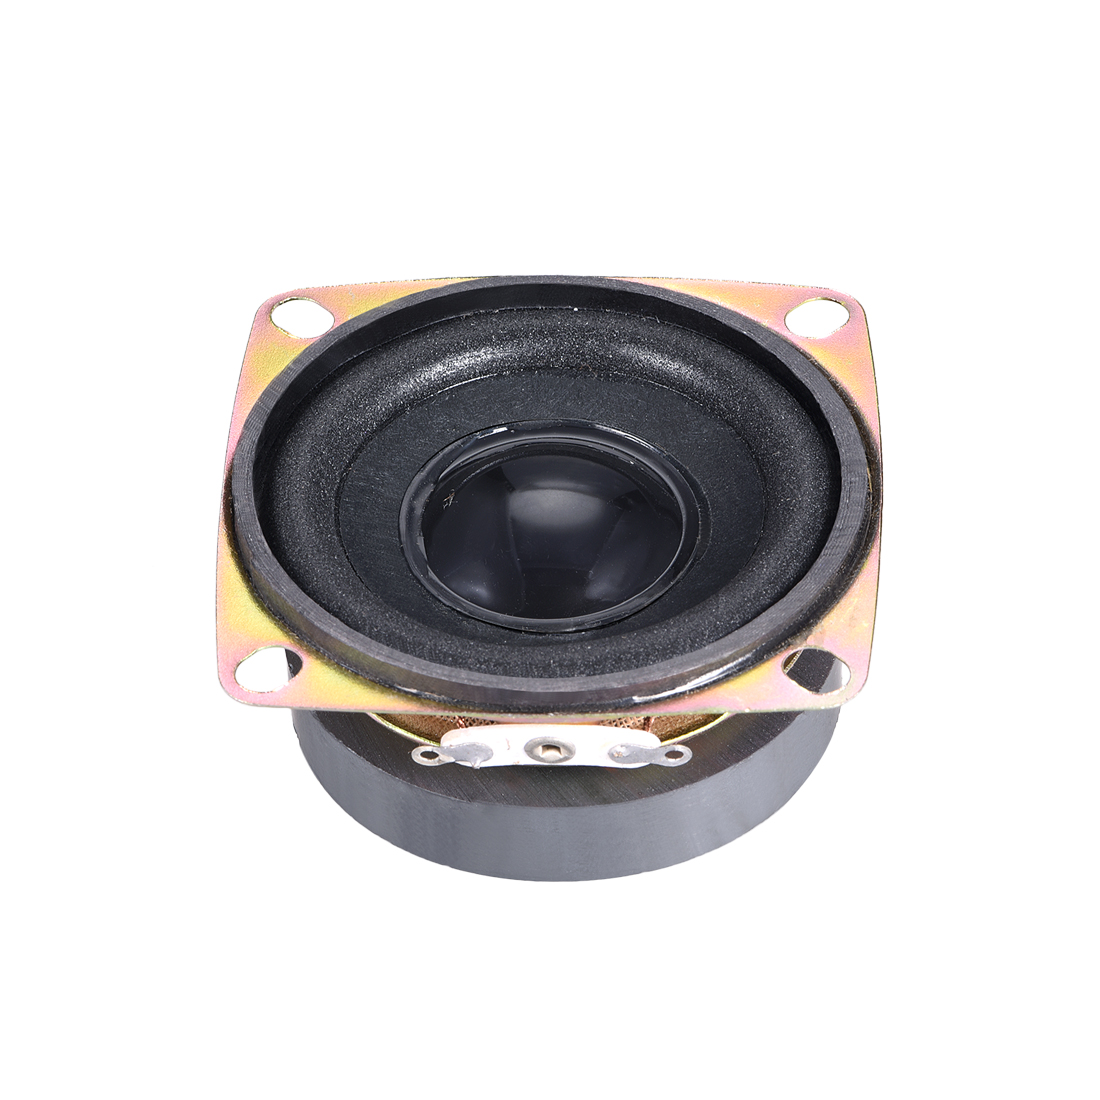 3W 52mm Speaker Square Shape 4 Ohm Loudspeaker for DIY Audio Speakers 2pcs - image 2 de 3